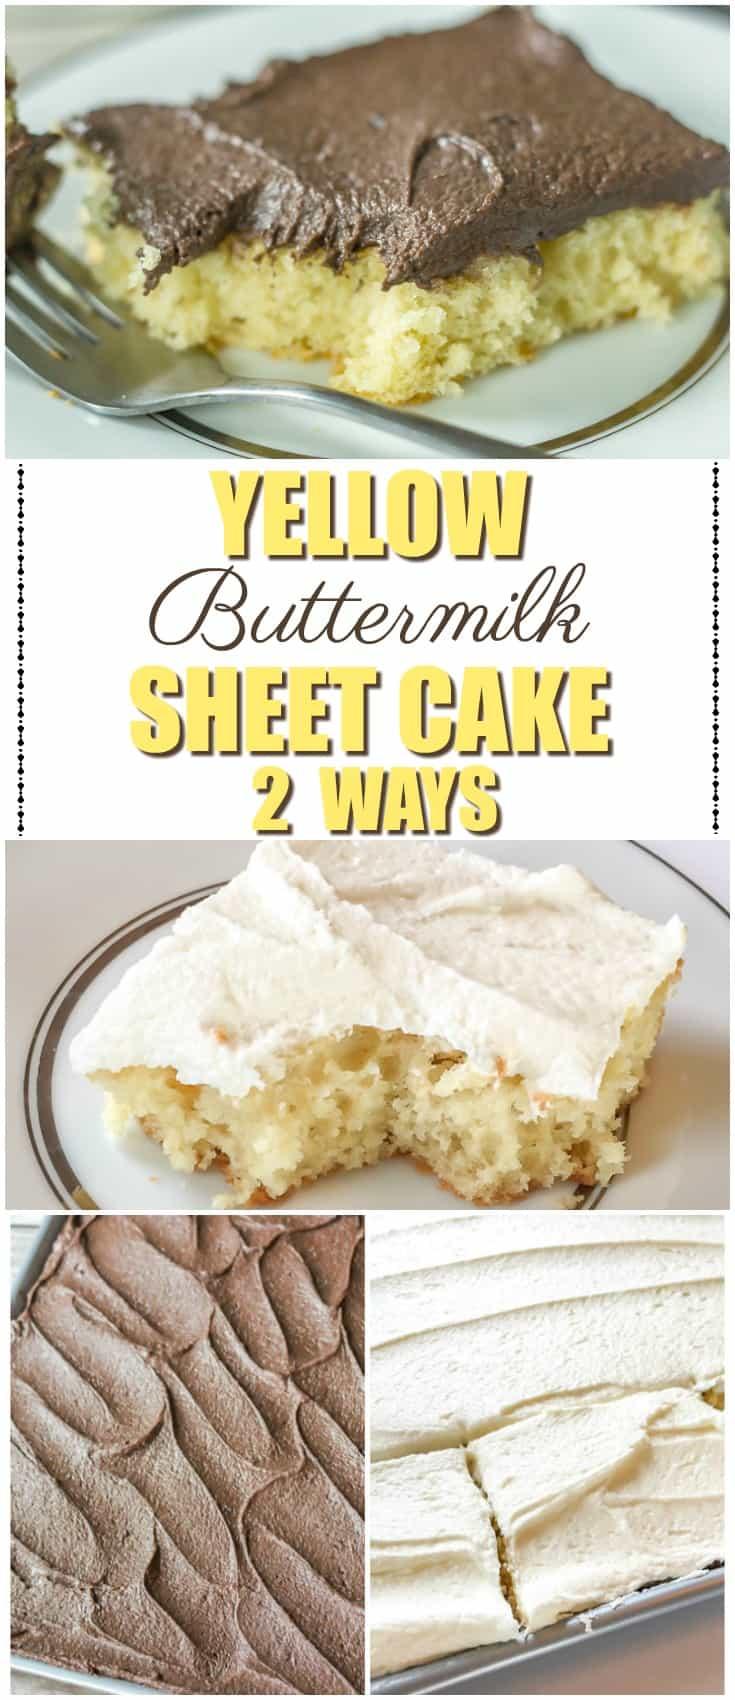 Yellow Buttermilk Sheet Cake 2 Ways Pinterest Graphic